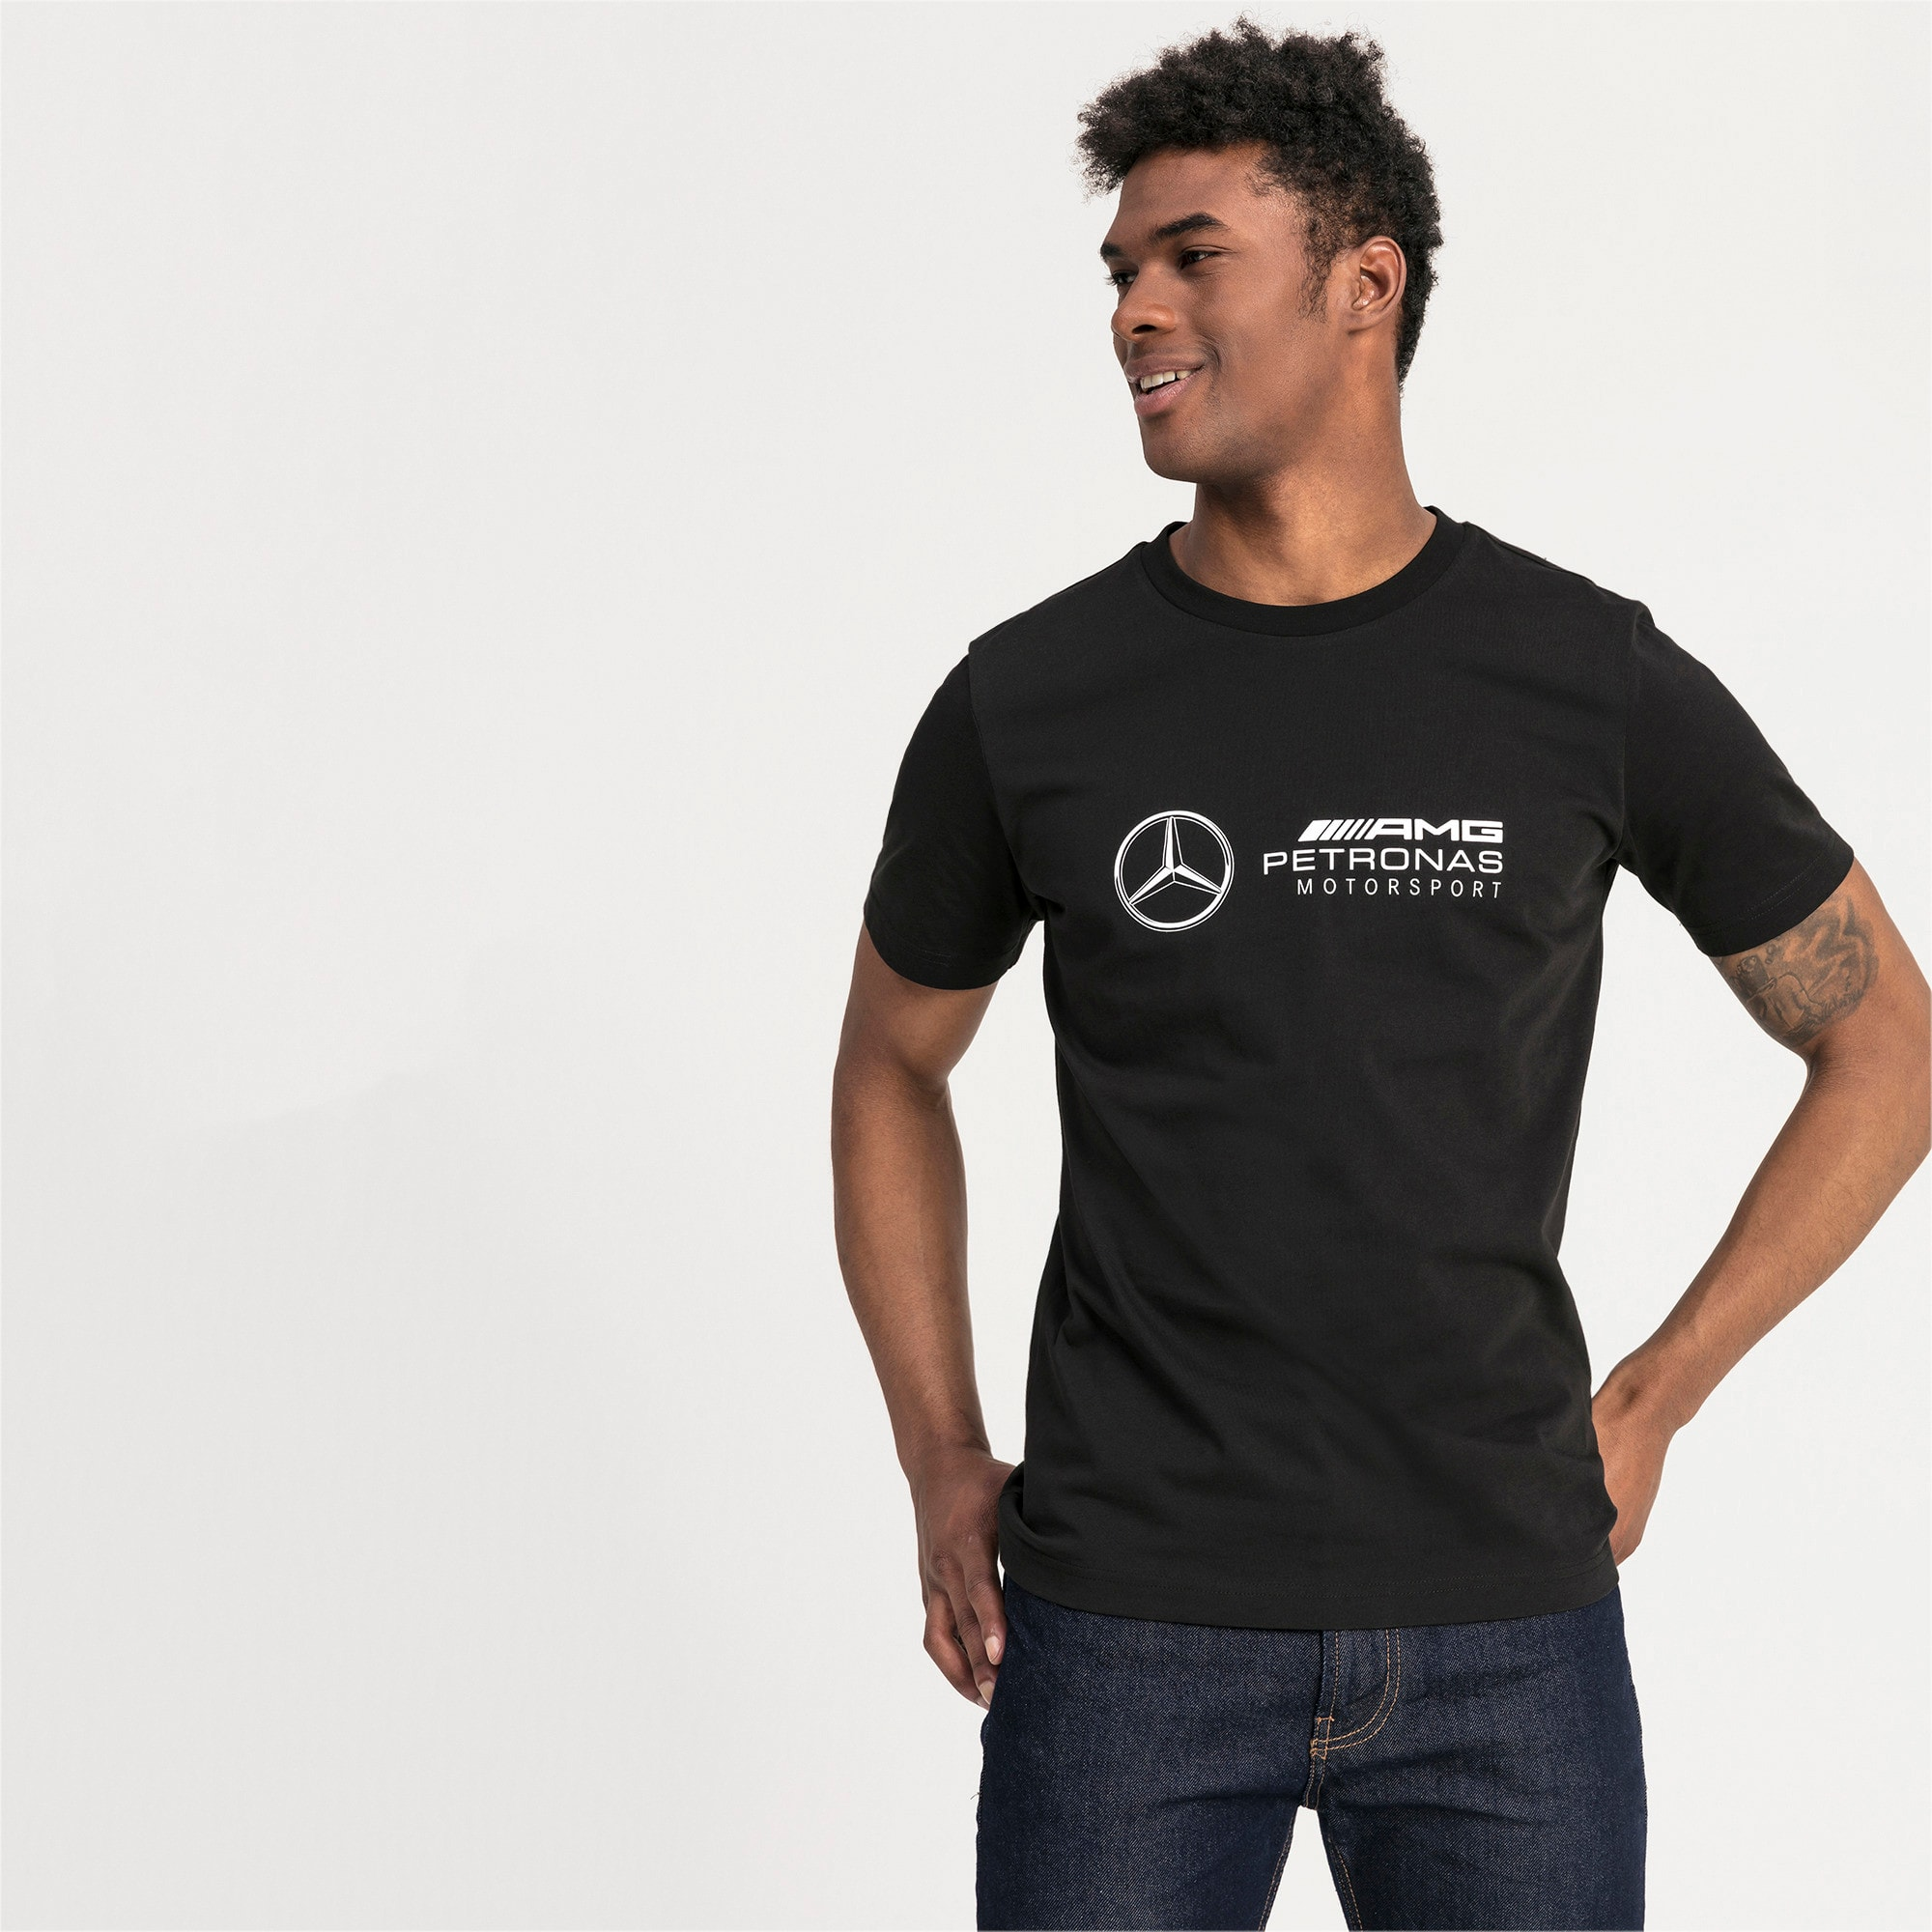 Thumbnail 1 of Mercedes AMG Petronas T-shirt met korte mouwen voor heren, Puma Black, medium